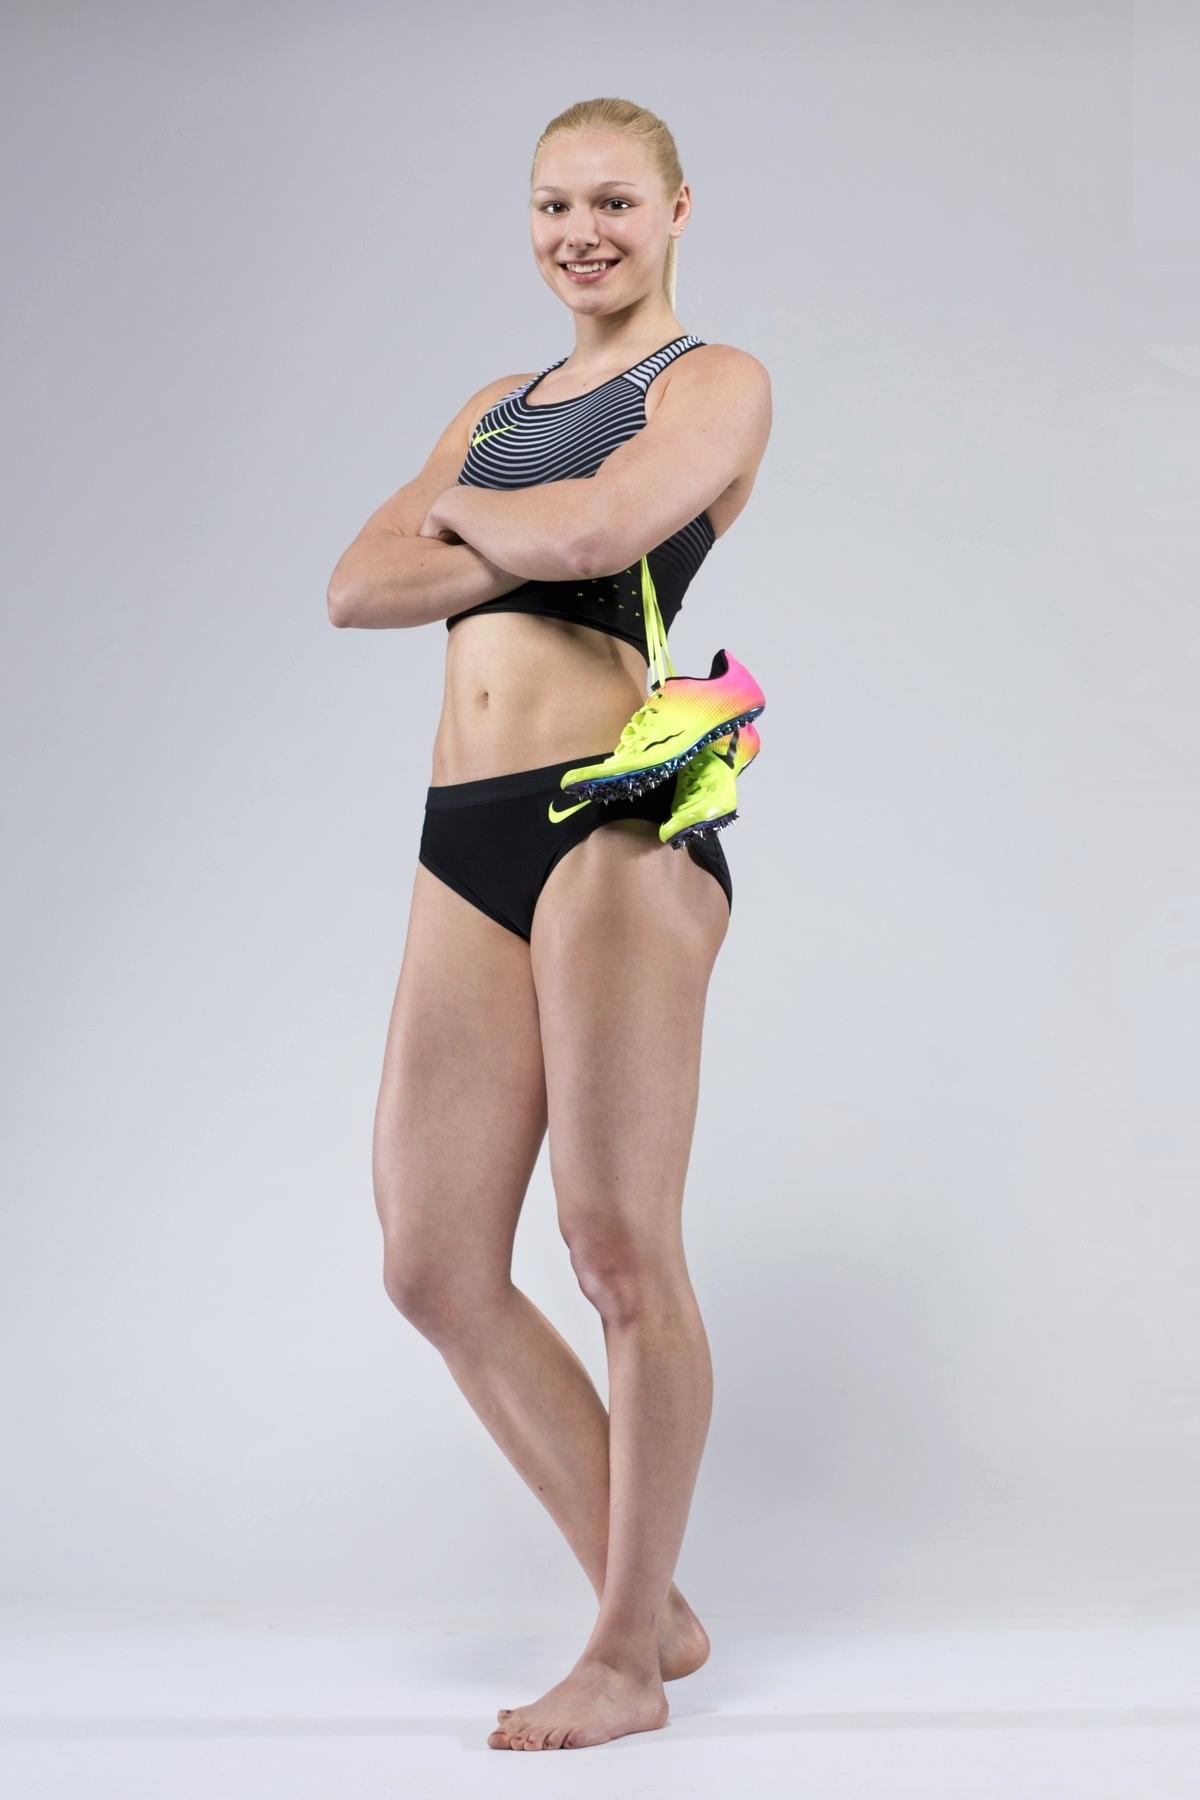 Lisa Mayer (Germany) – Gymnastics